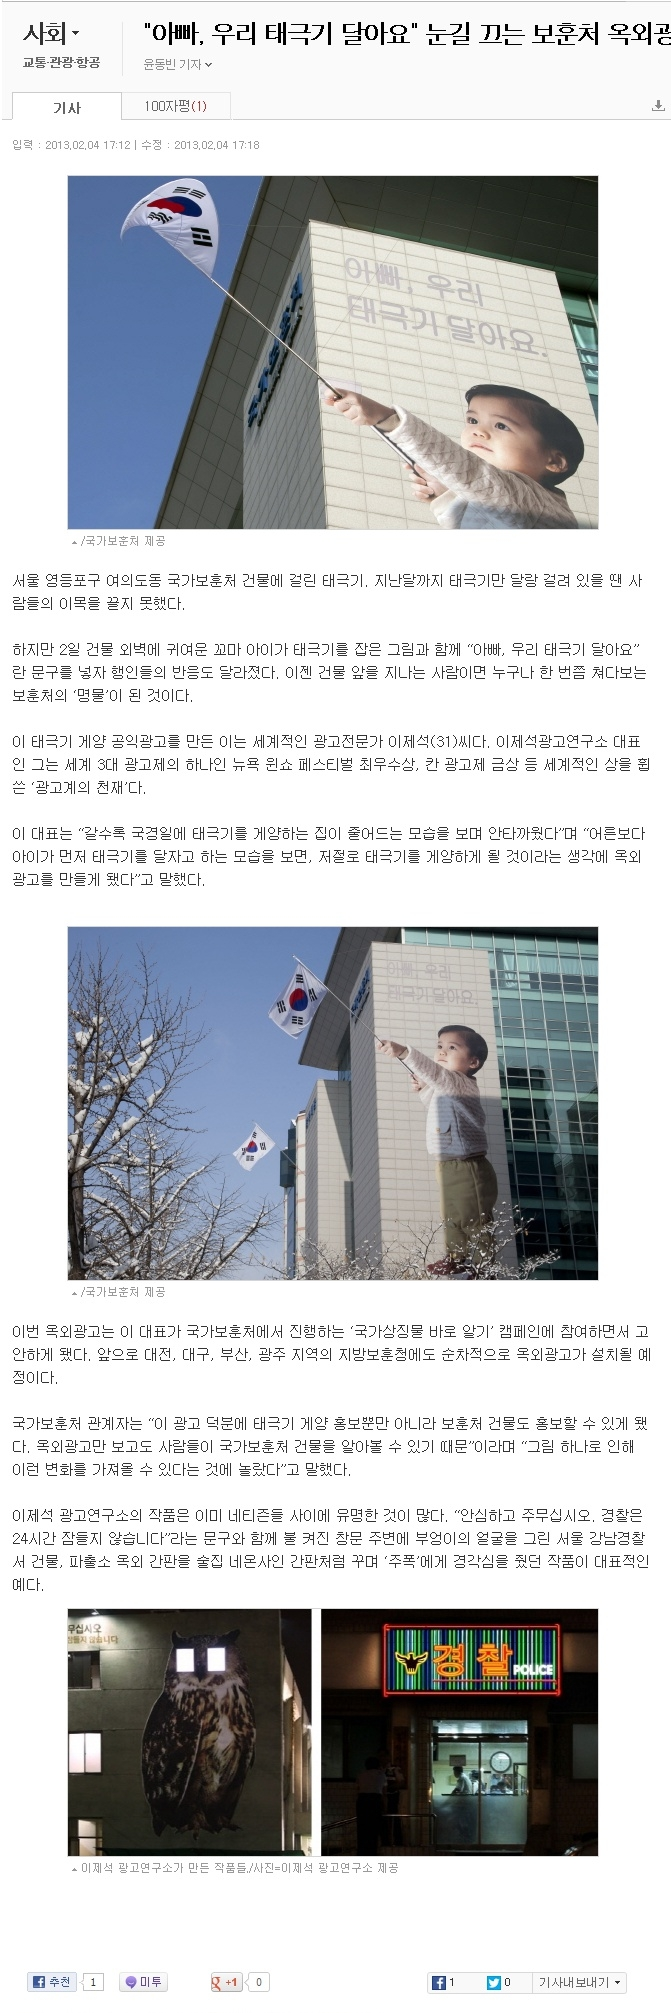 chosun_news.chosun.comsitedatahtml_dir201302042013020401703.html.jpg